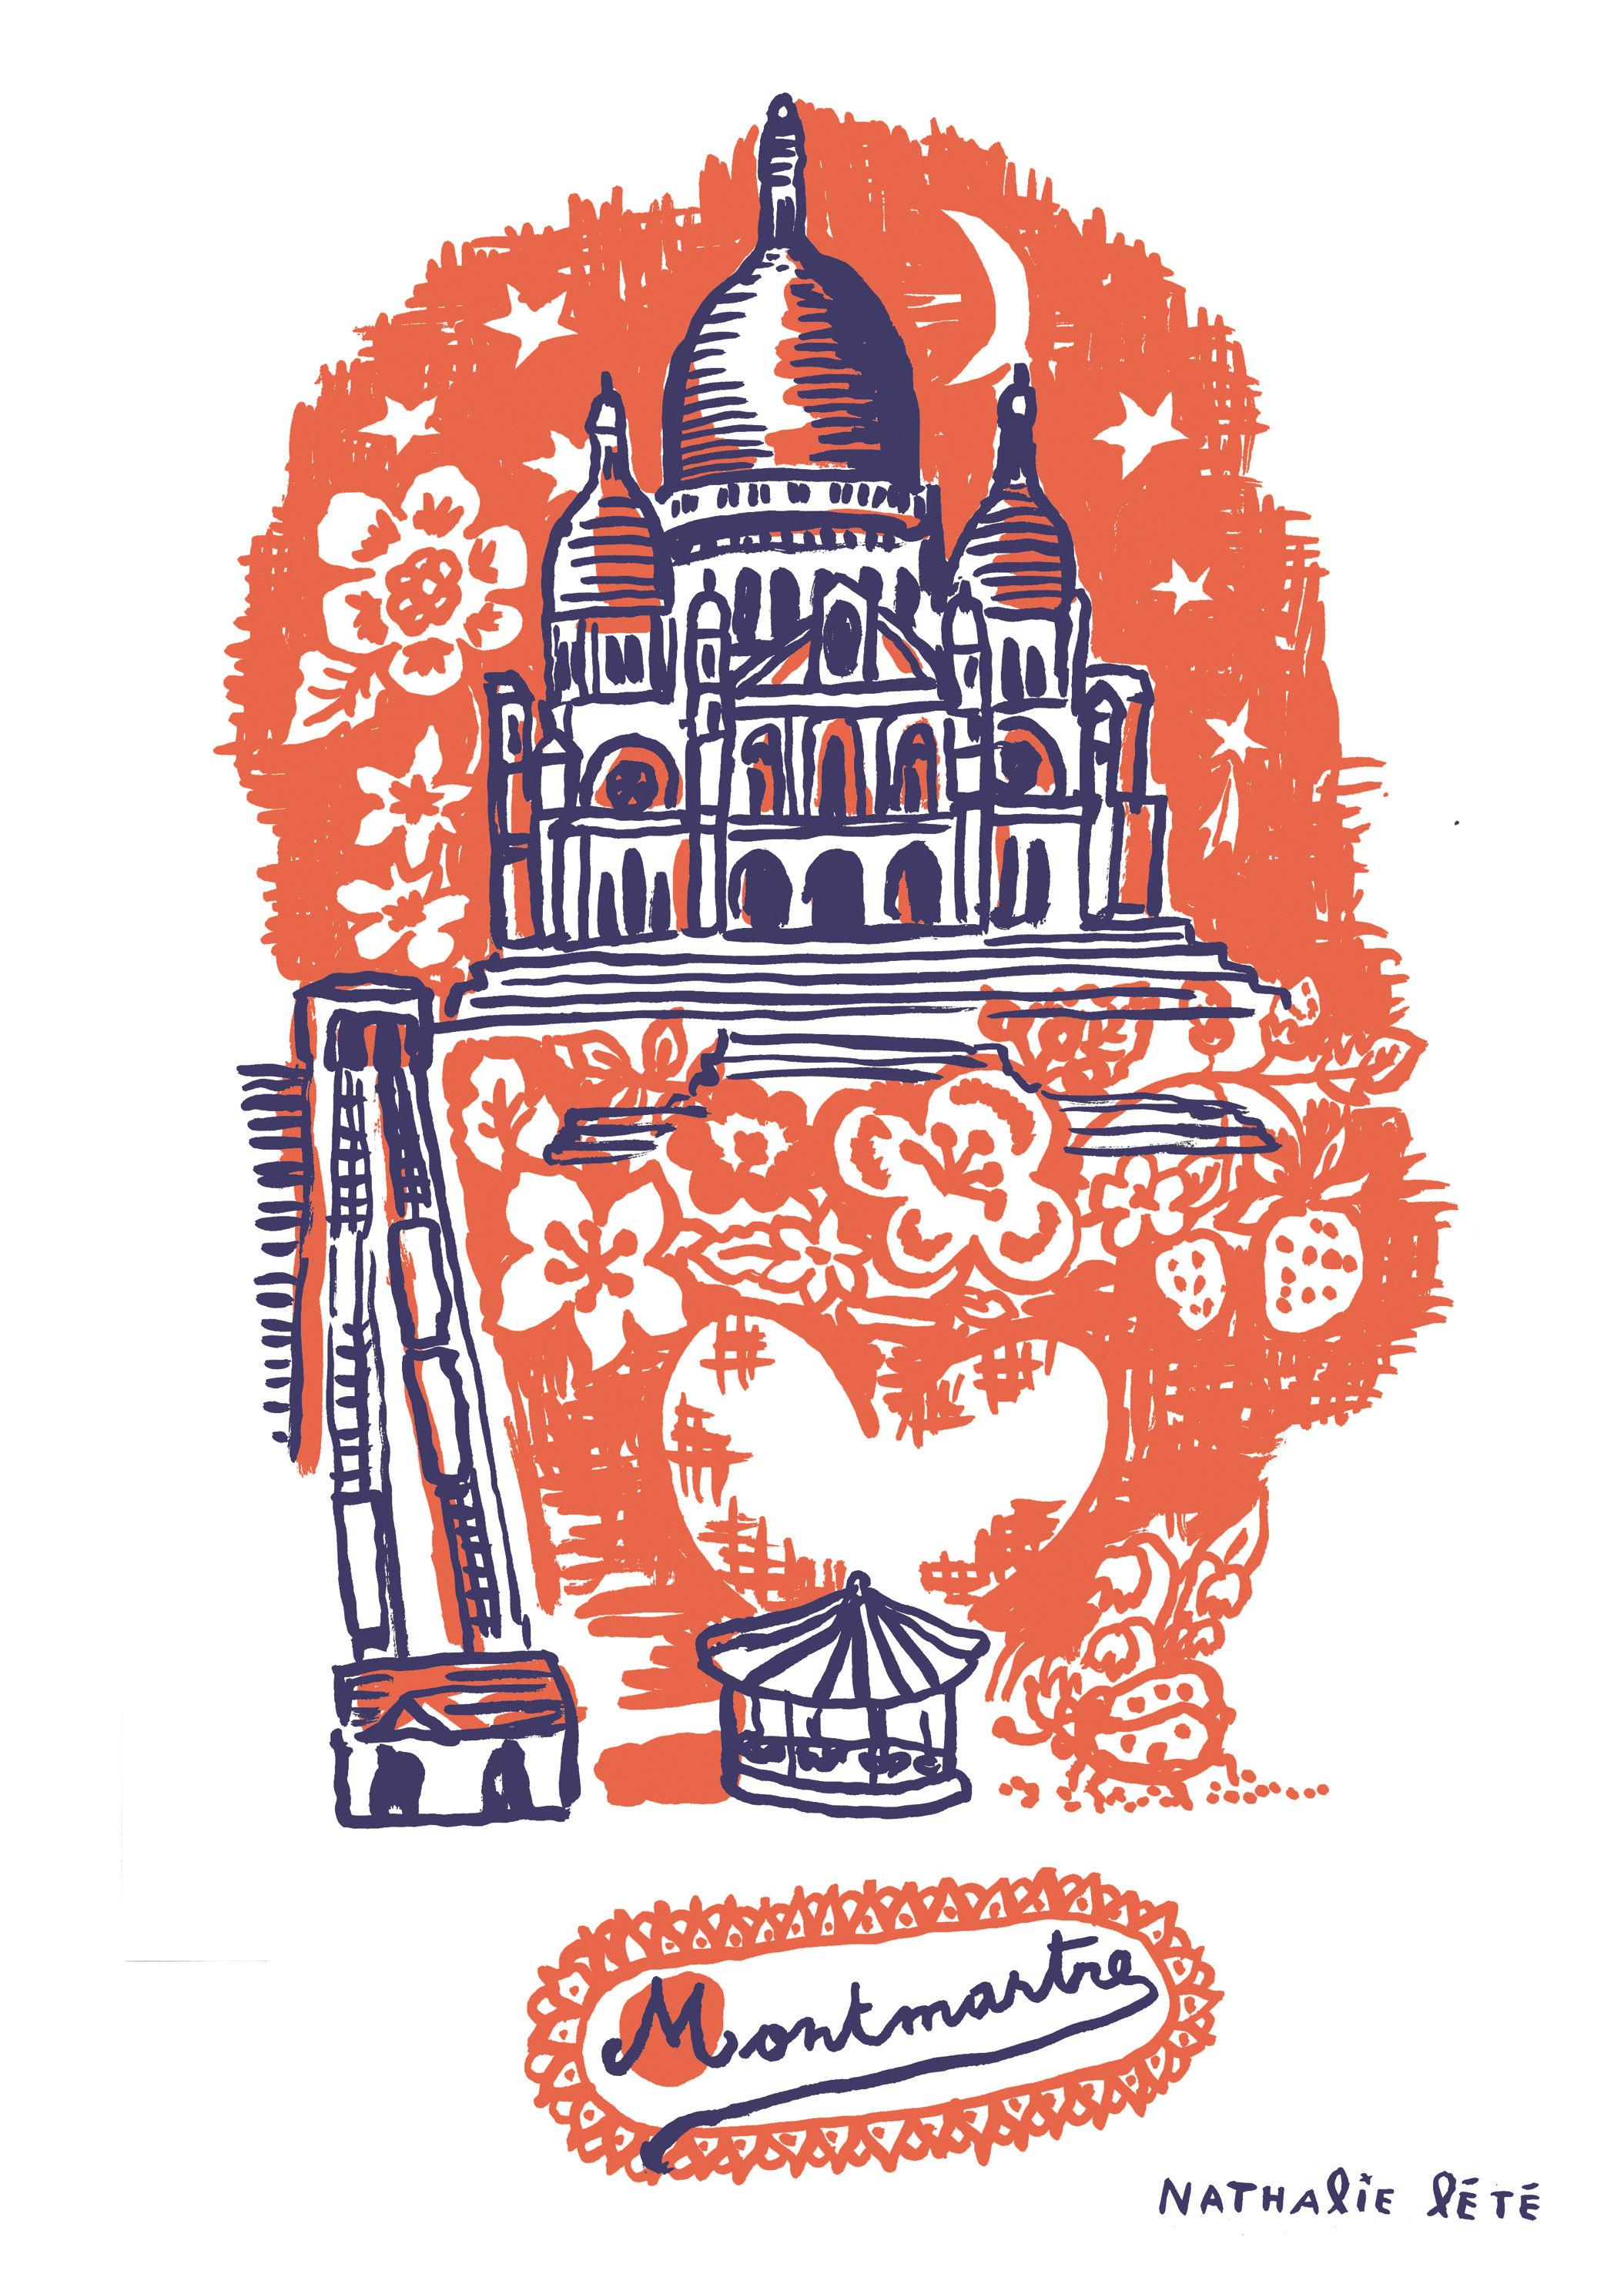 Decoration - Children's Home Accessories - Montmartre Sticker - 25 x 35 cm by Domestic - Orange - Vinyl